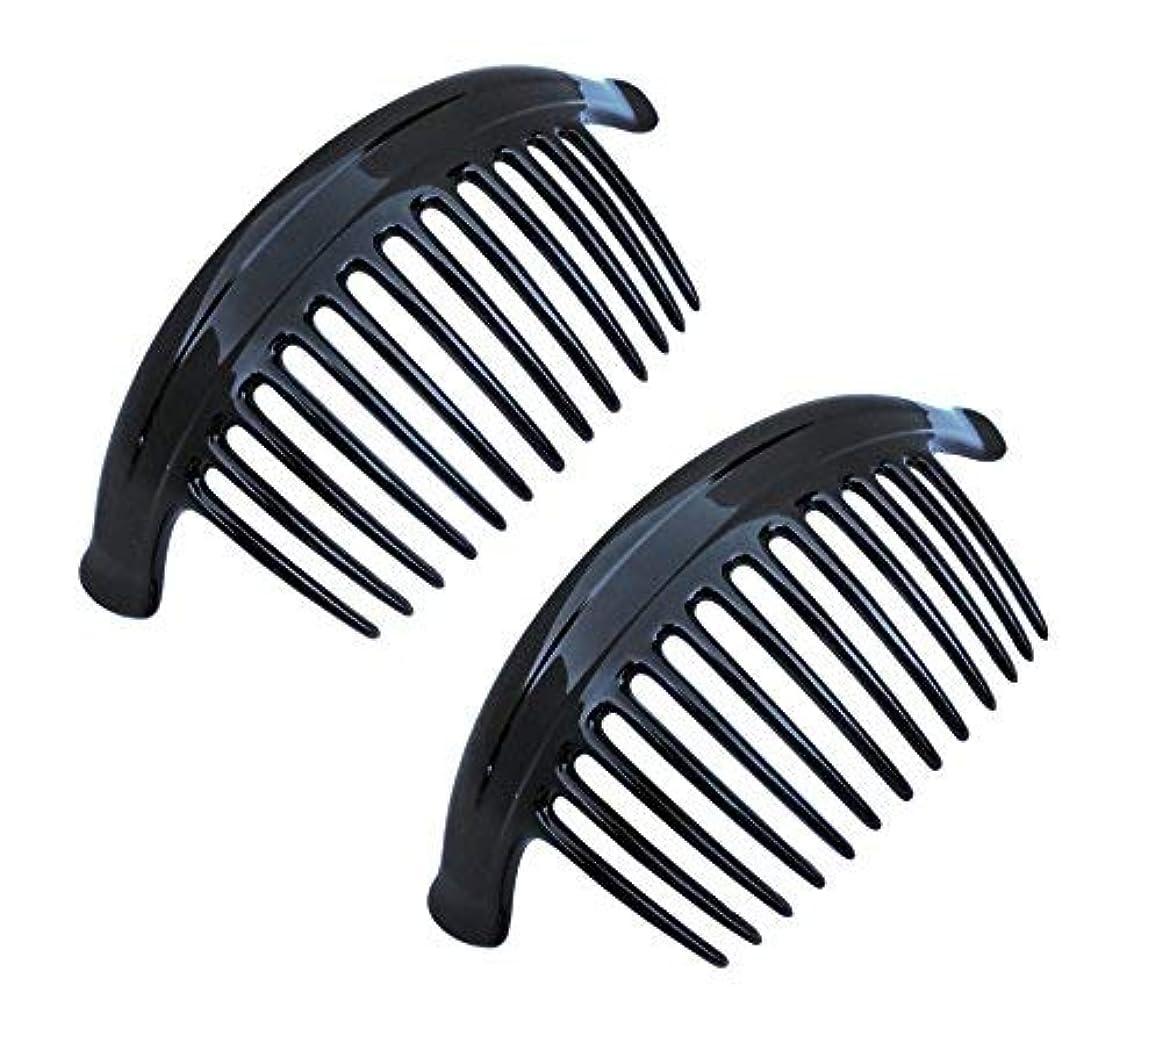 形式文明化十年Parcelona French Arch Extra Large Black 13 Teeth Interlocking Side Hair Combs Pair [並行輸入品]